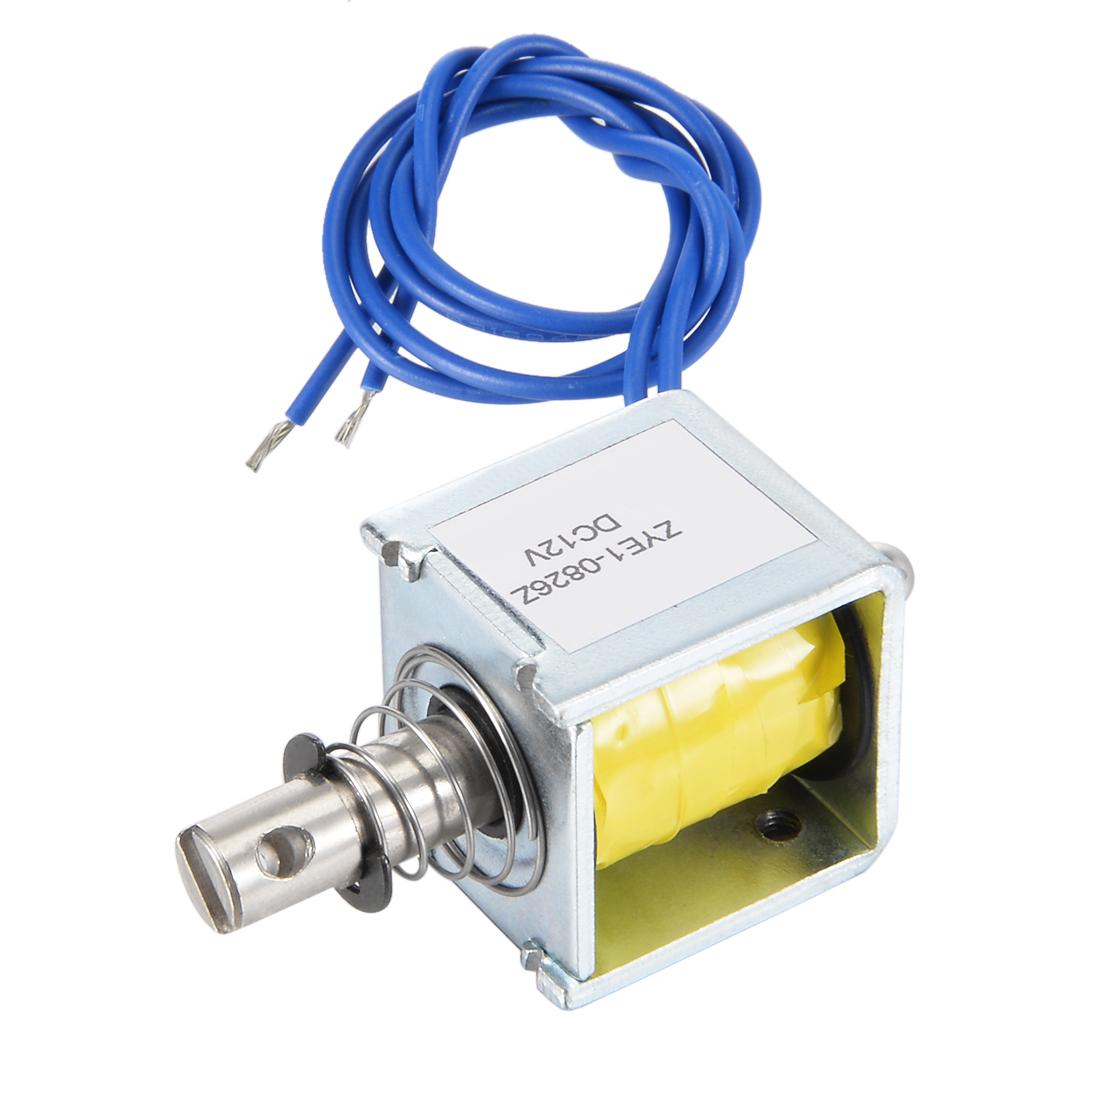 ZYE1(TAU)-0826Z DC 12V 14.4W Push Pull Type Open Frame Solenoid Electromagnet